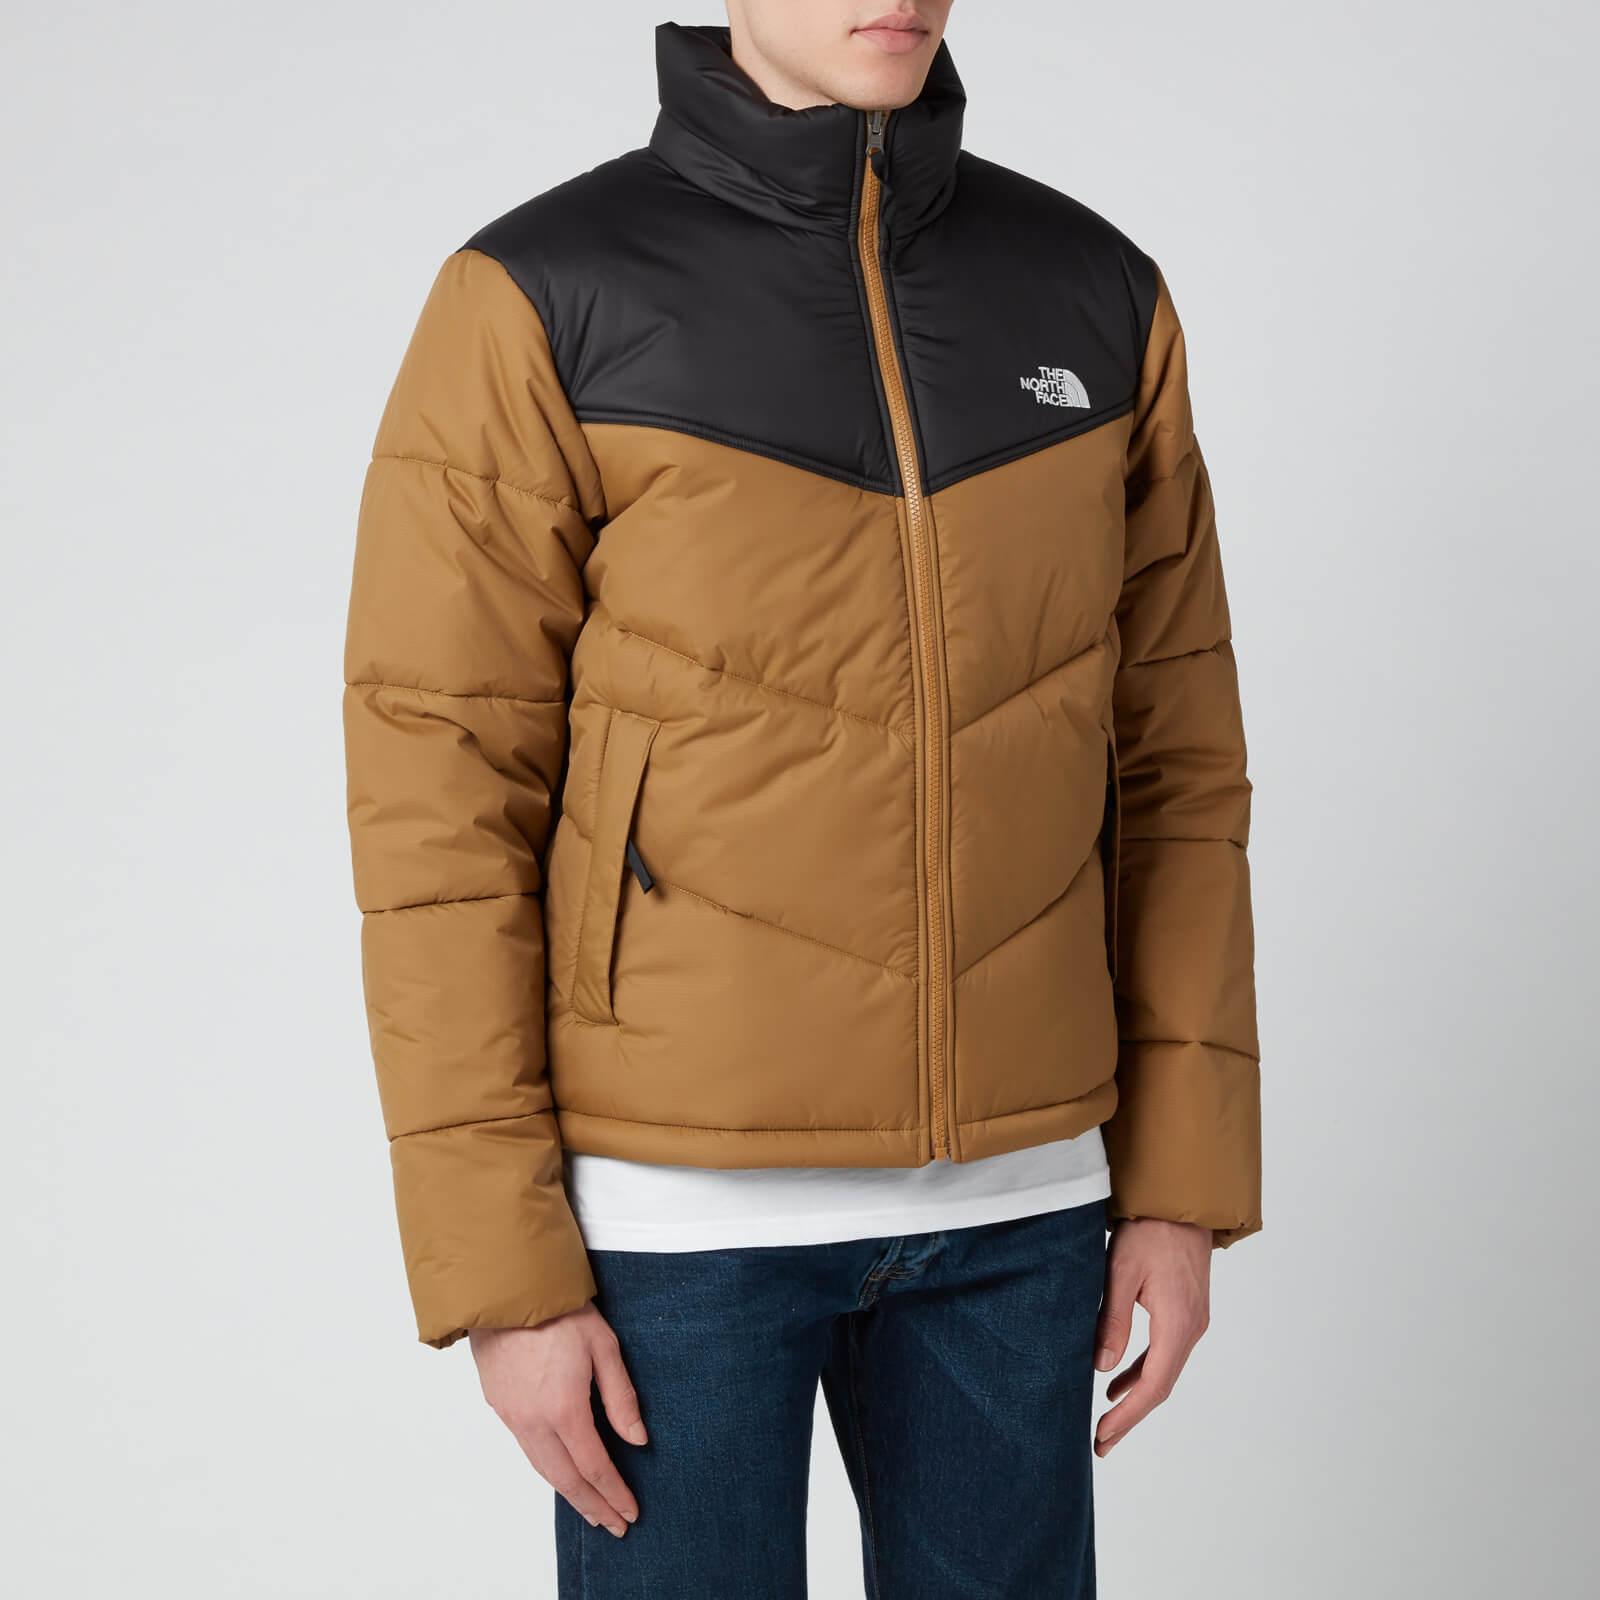 The North Face Men's Saikuru Jacket - British Khaki